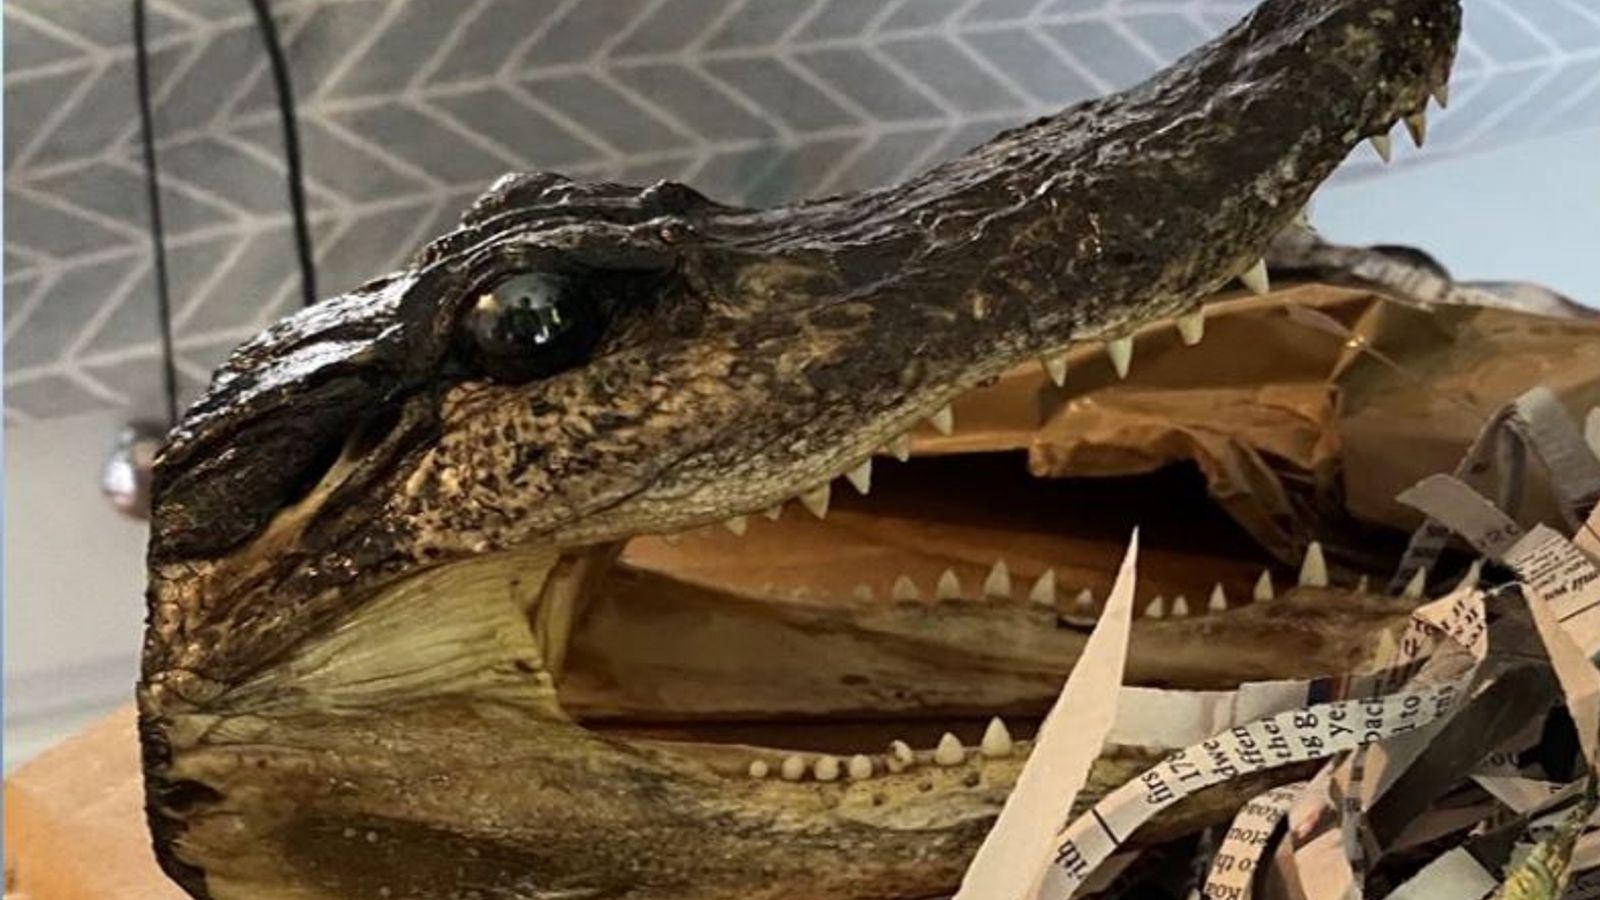 Eighty alligator heads seized in police raid on house in Birmingham